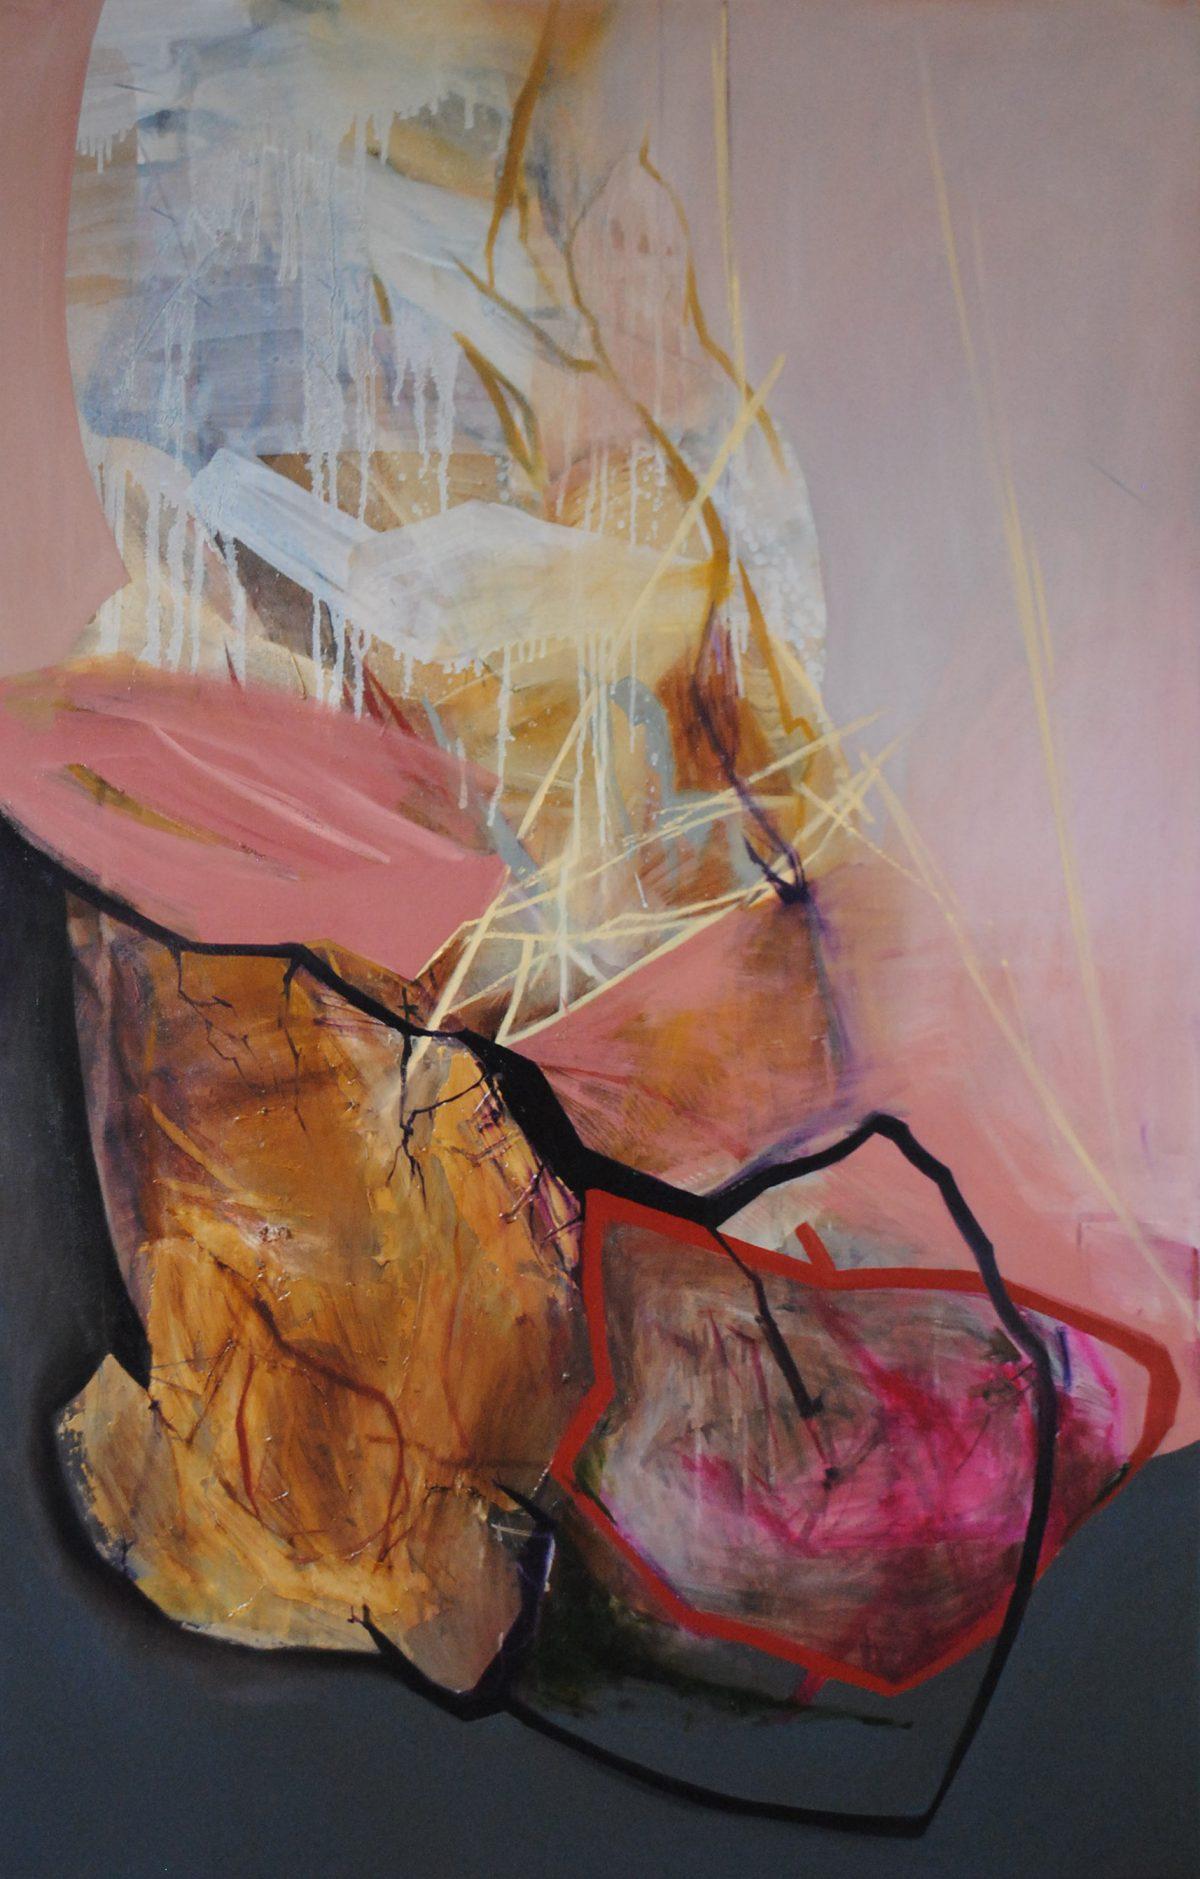 Fragments 5, acrylic and oil on canvas, 2019, 100x150 cm